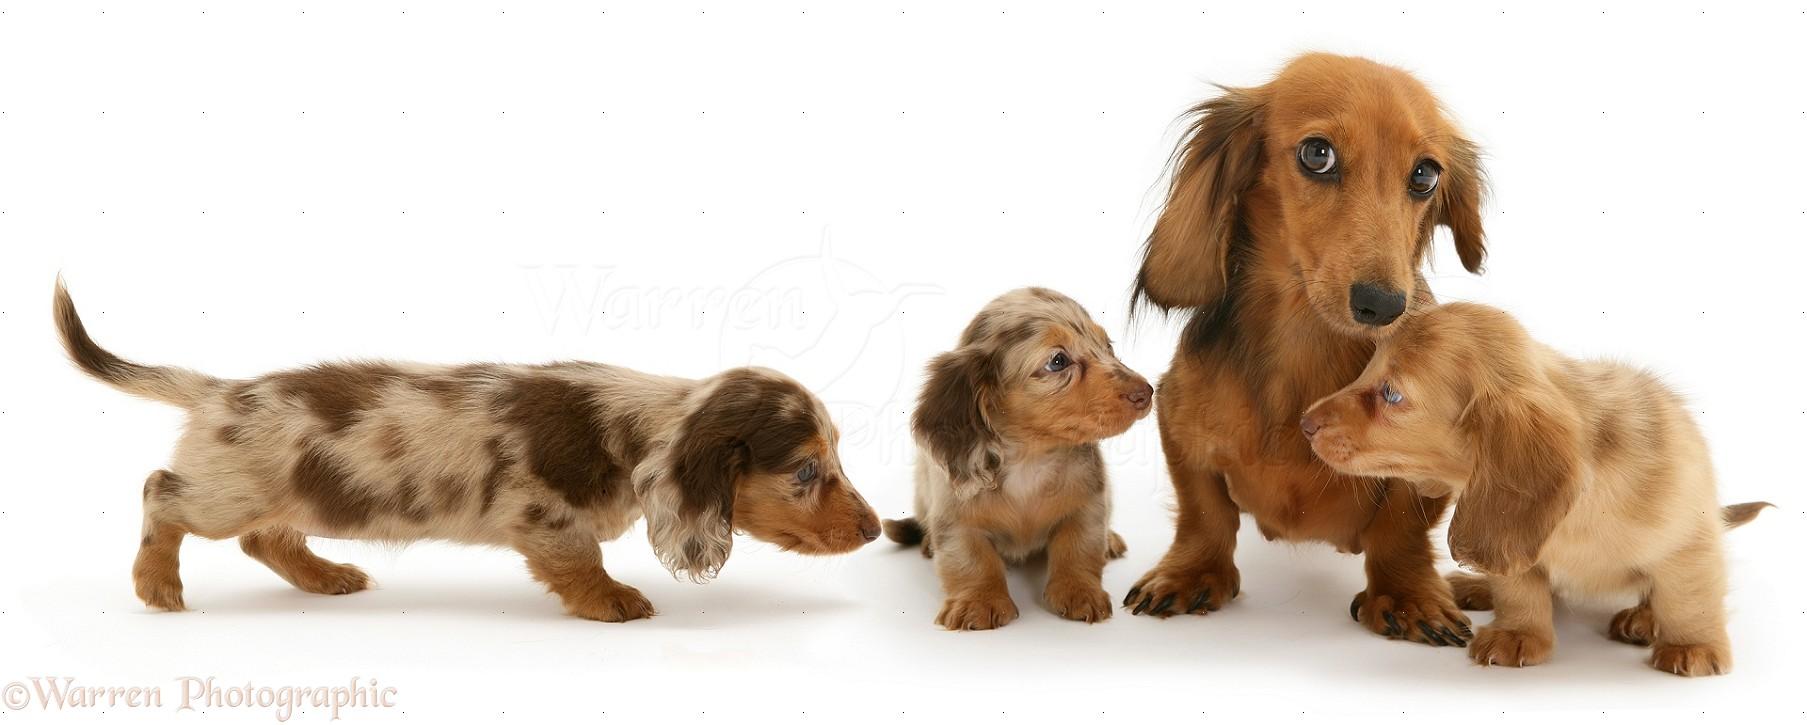 Dogs Dachshund Family Photo Wp14569